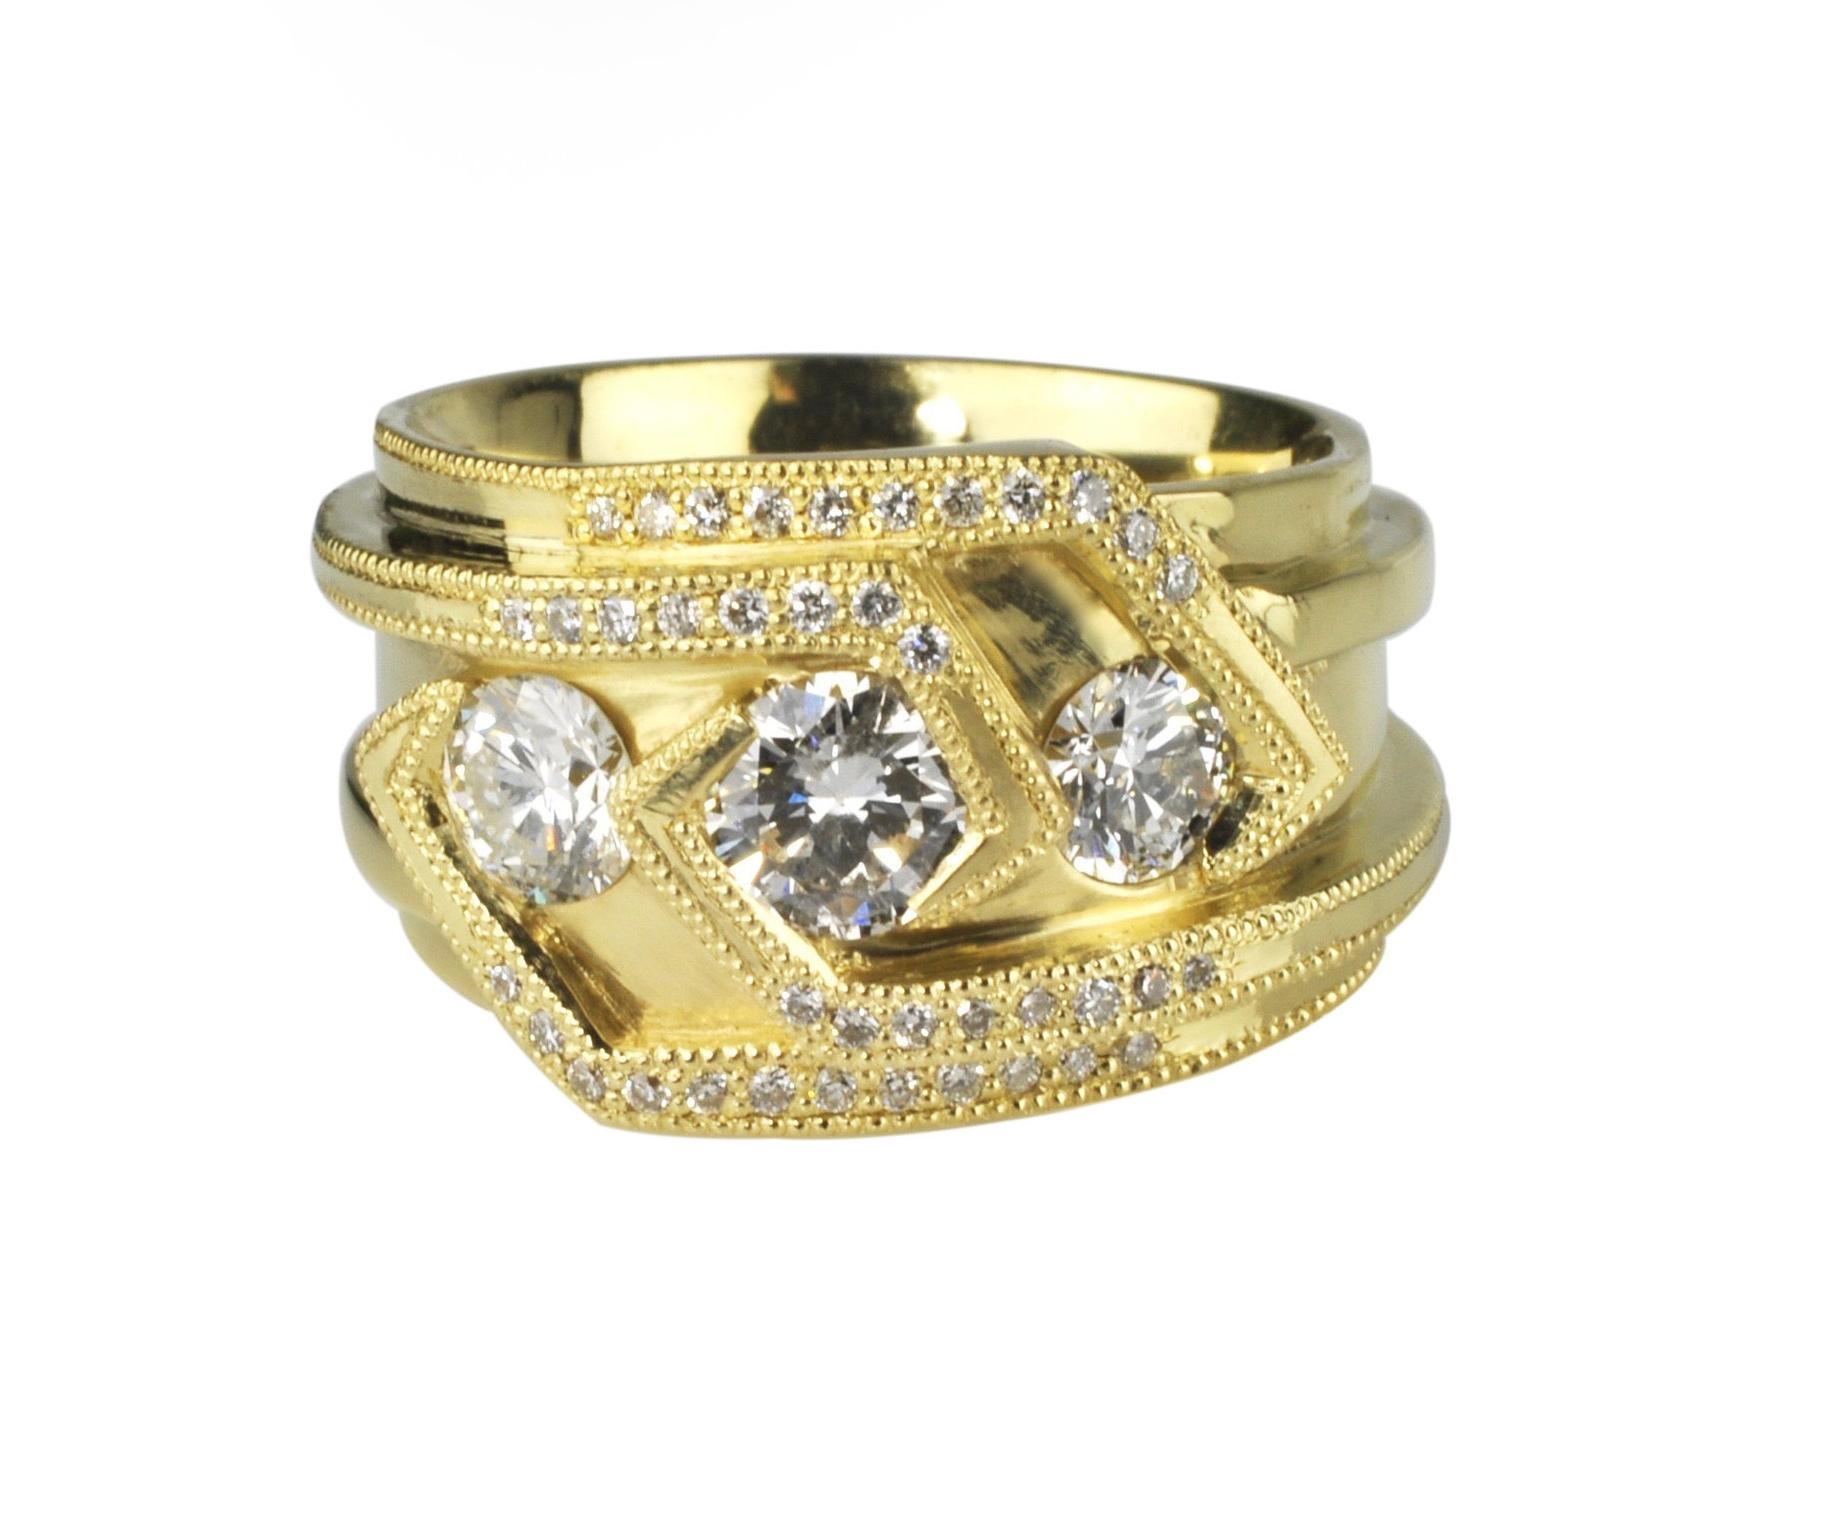 Waylon Rhoads Original 18k Gold Ring with a Trinity of Round Diamonds